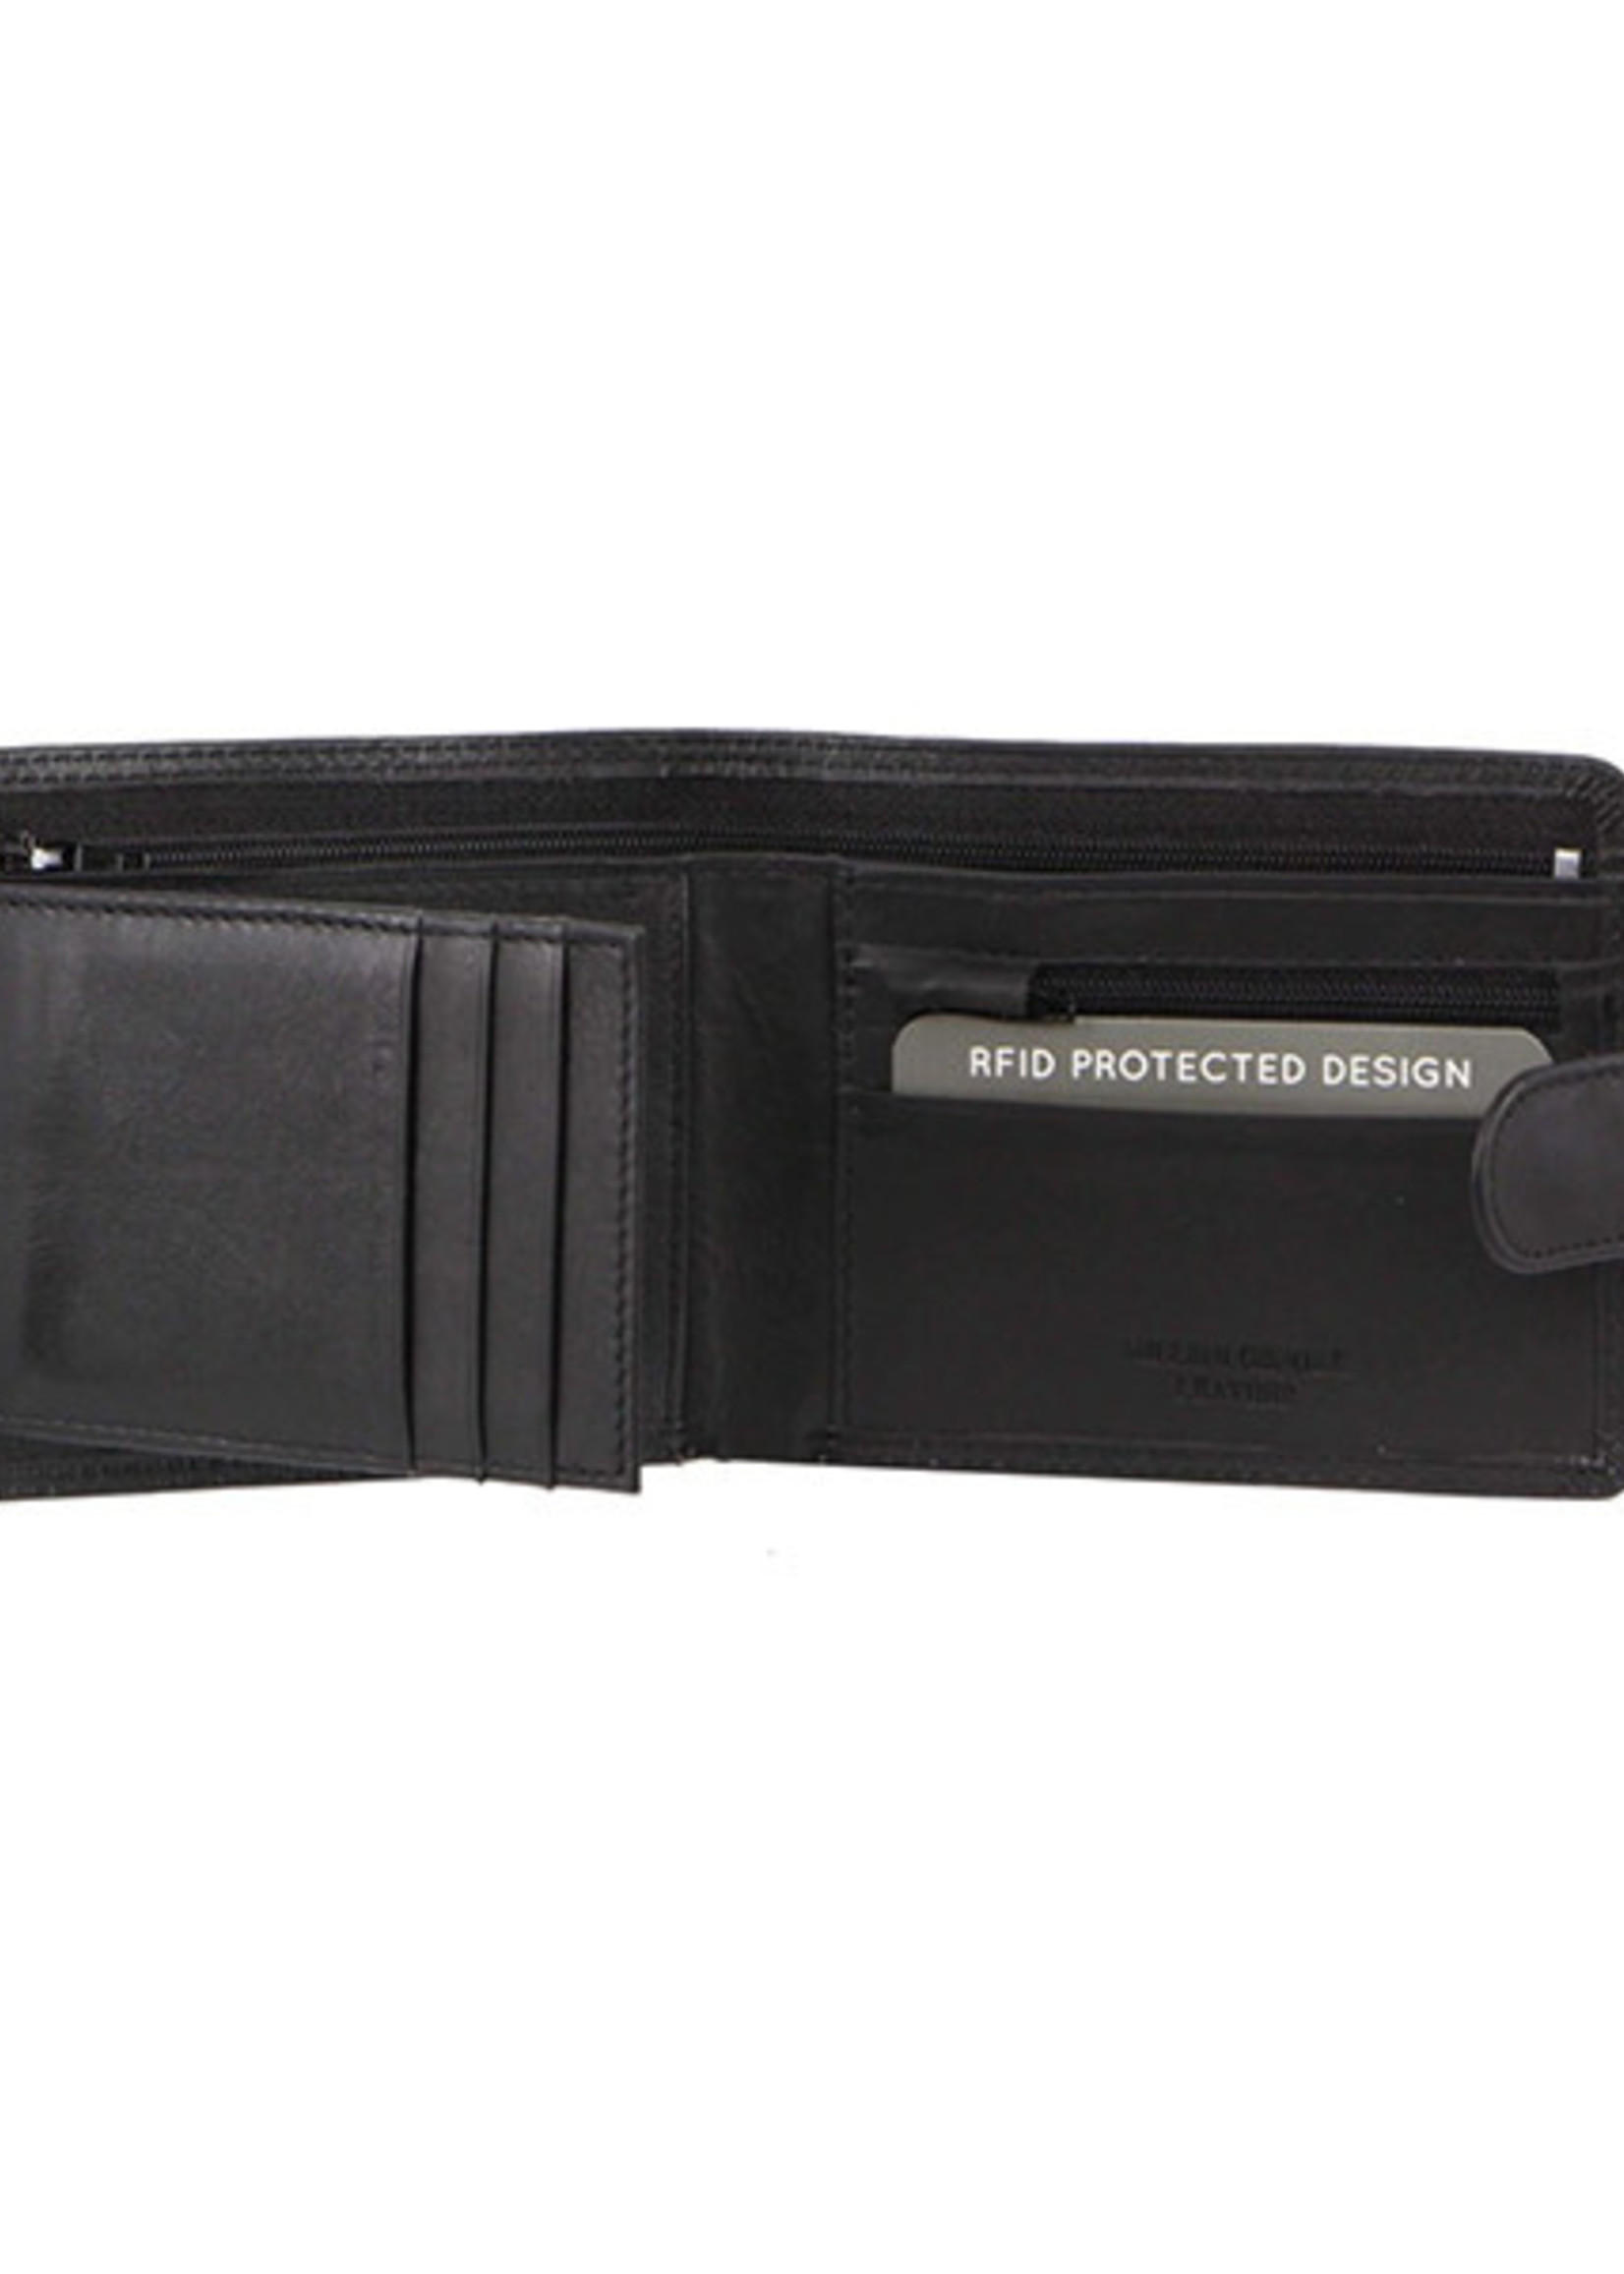 Milleni Men's Wallet - Black (C10541)